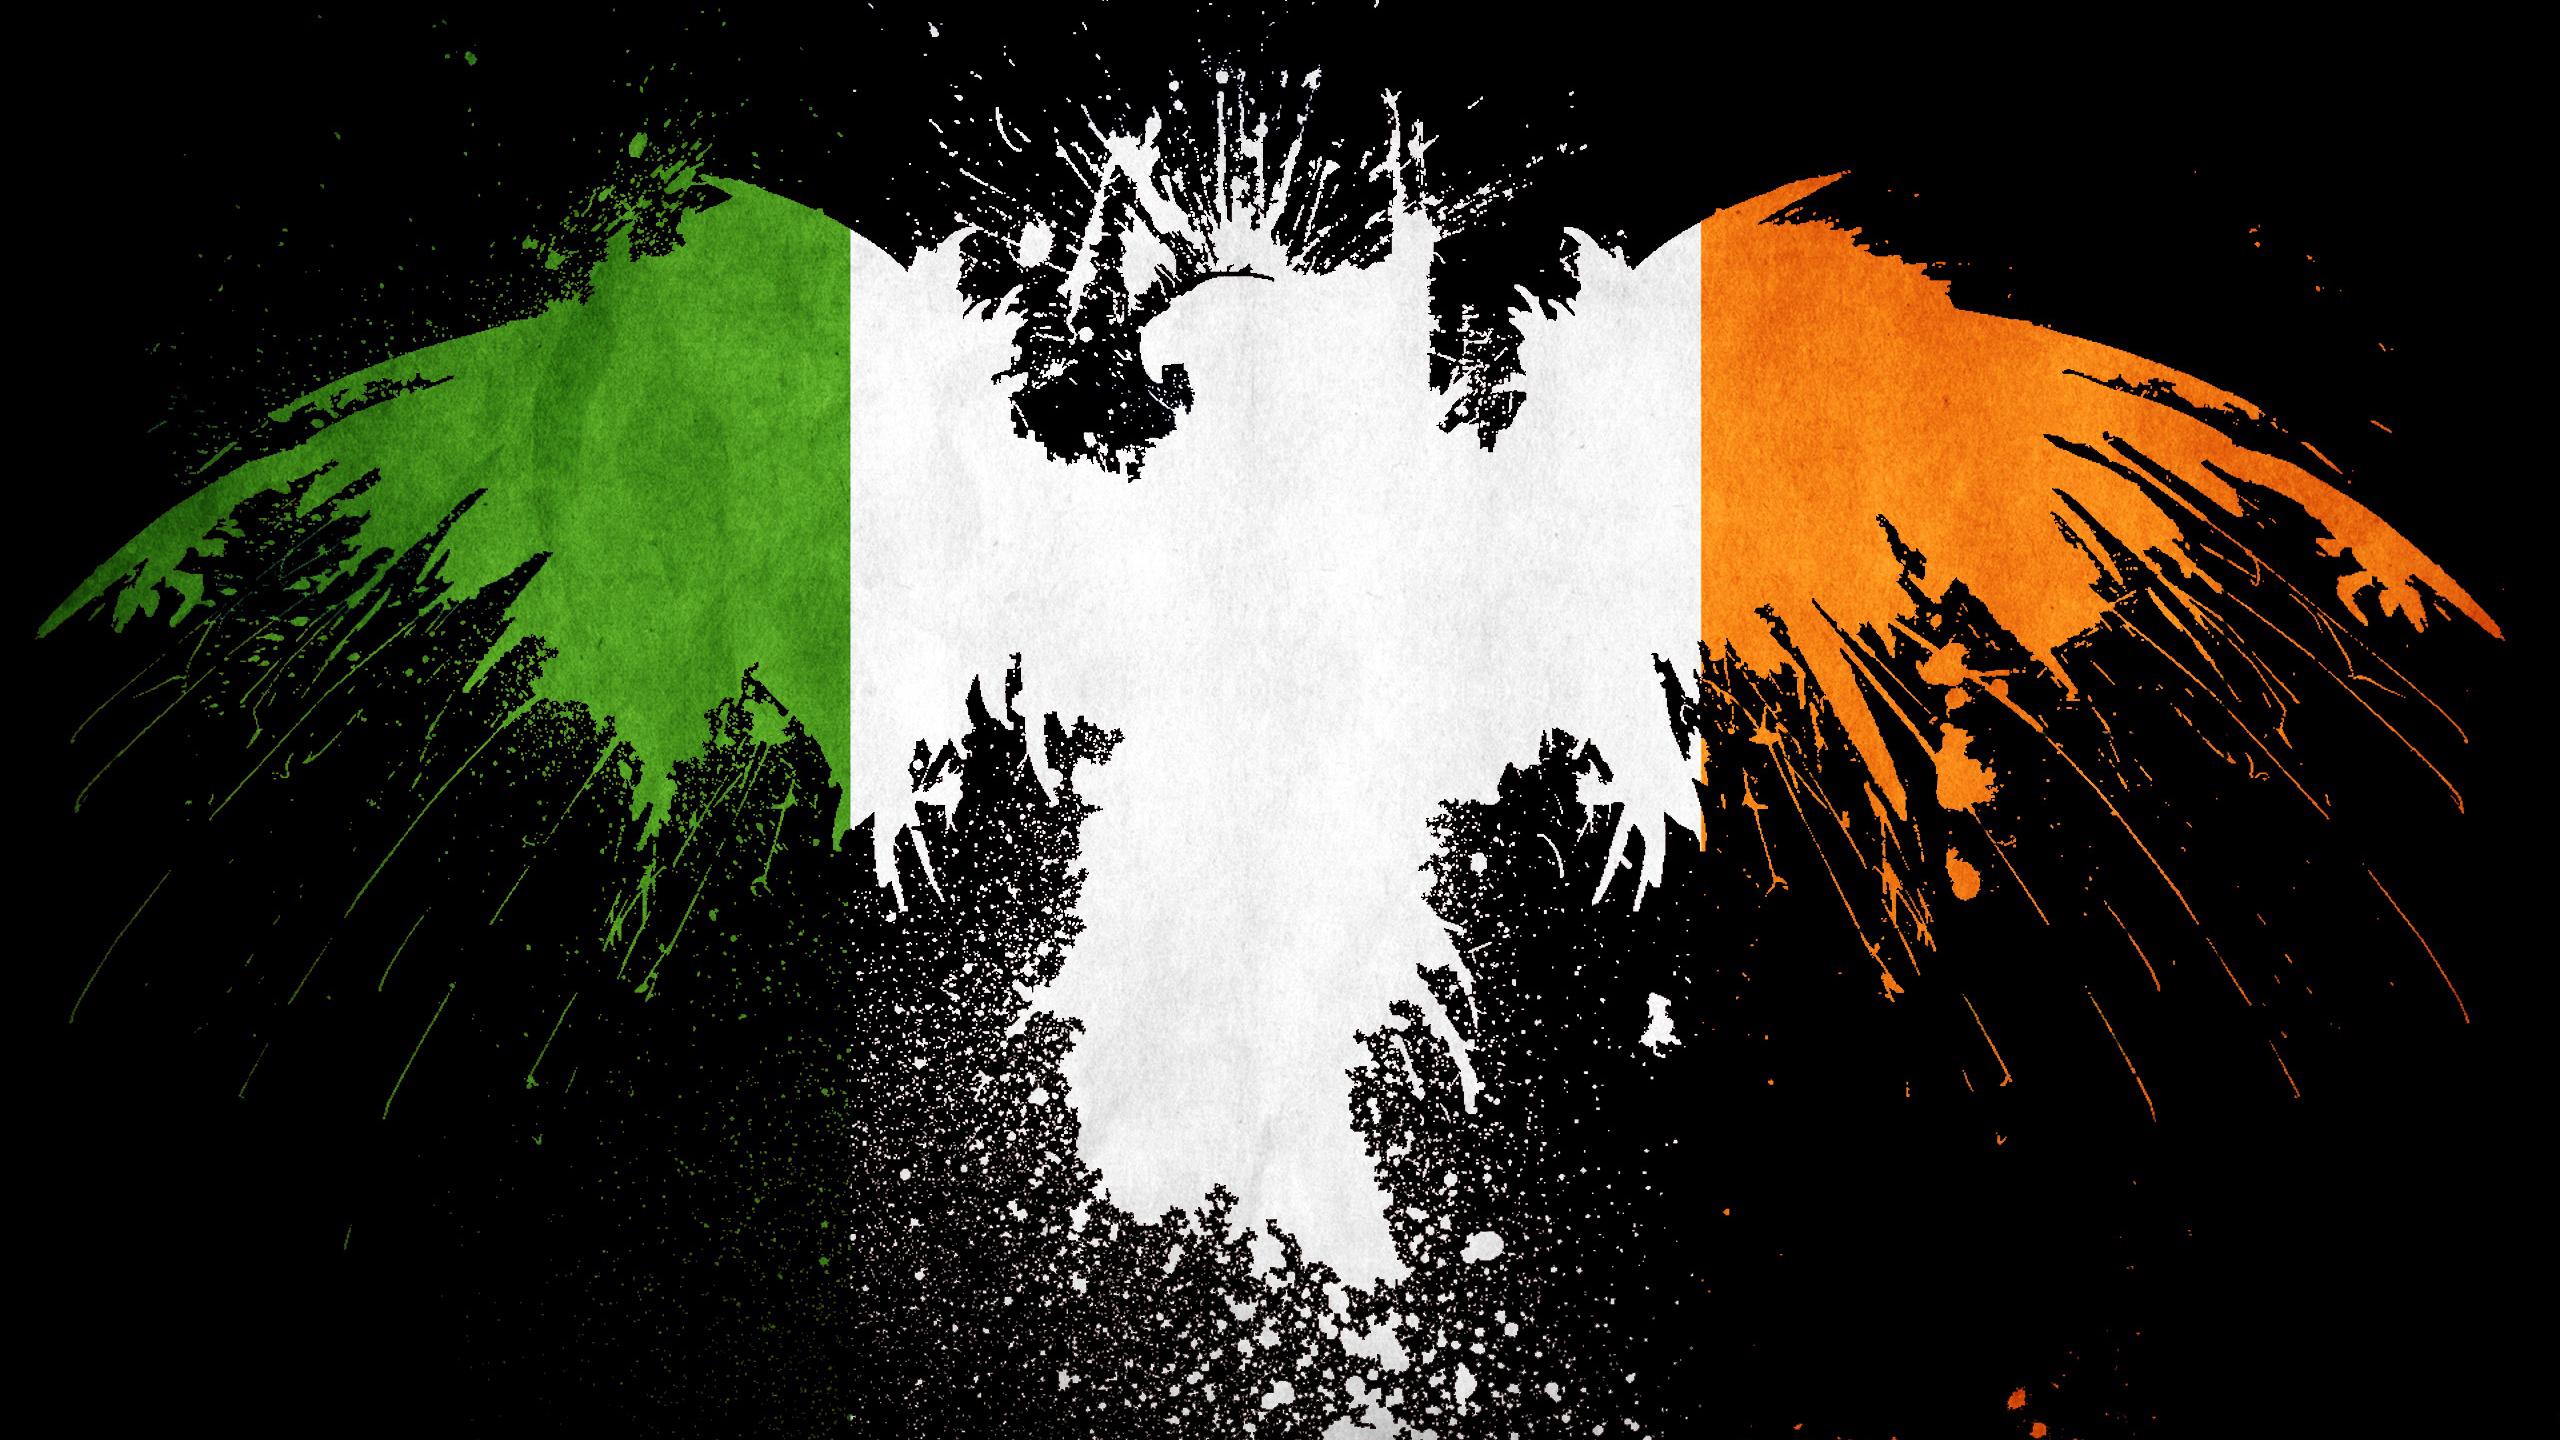 hd image, indian flag - chuck comelini